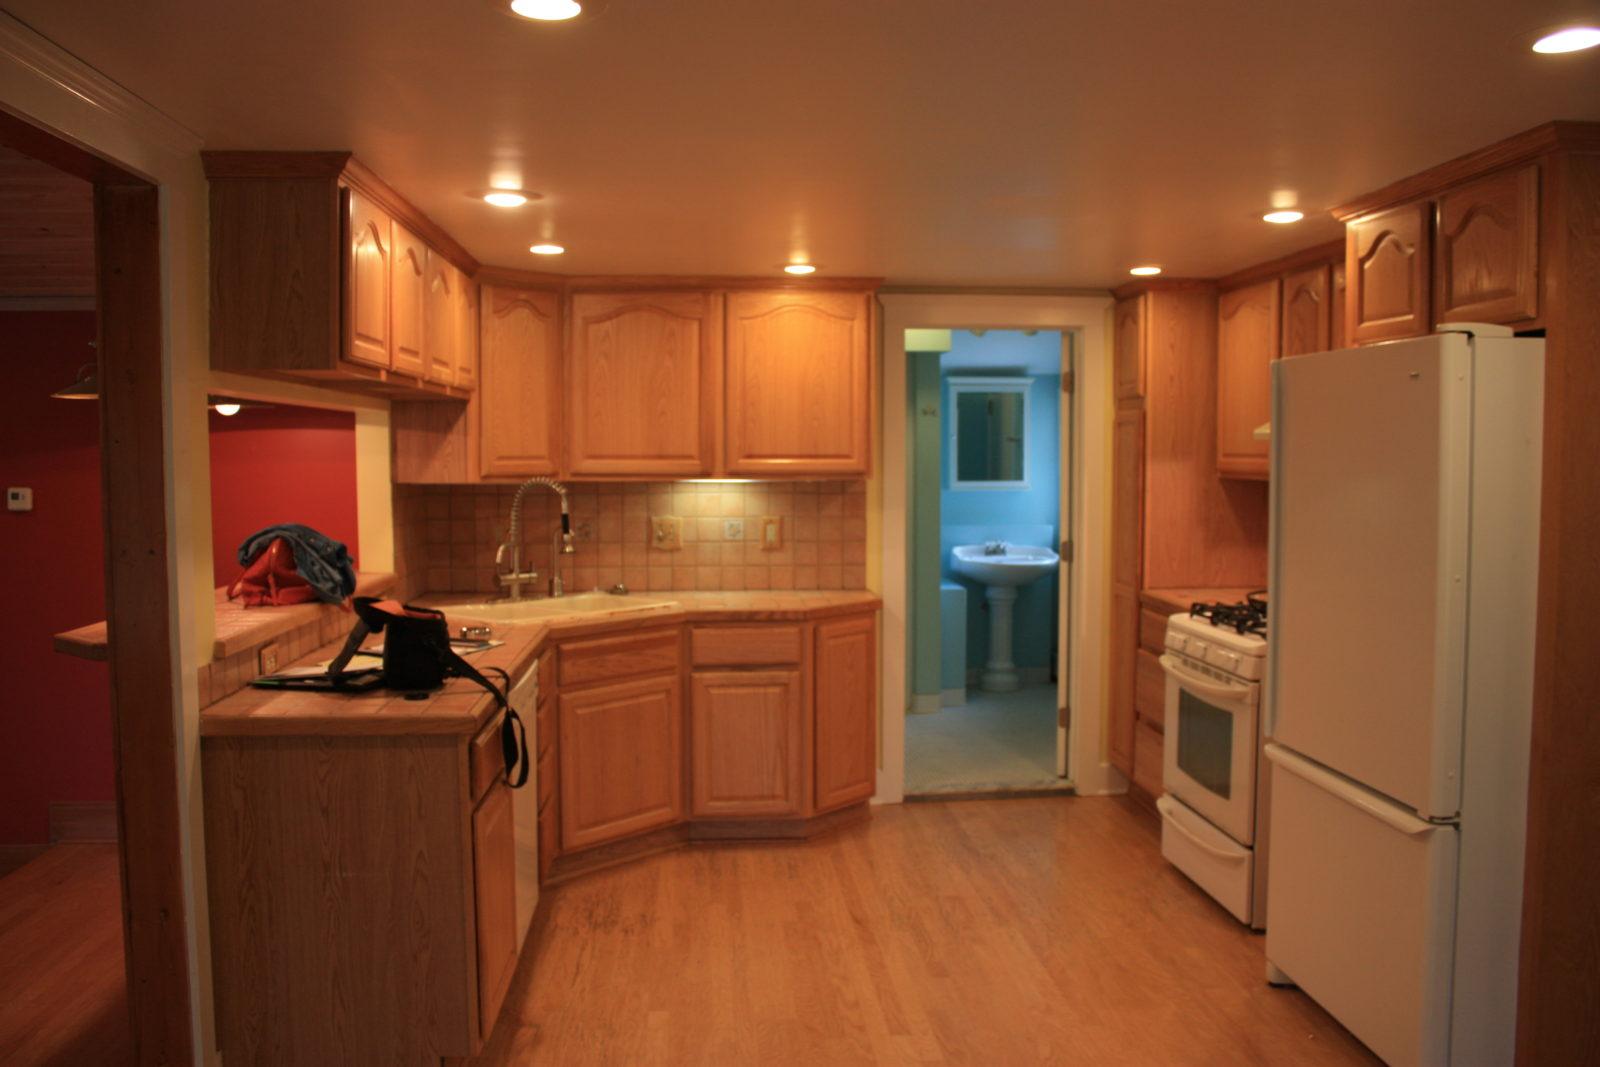 Winans Lake Kitchen Before